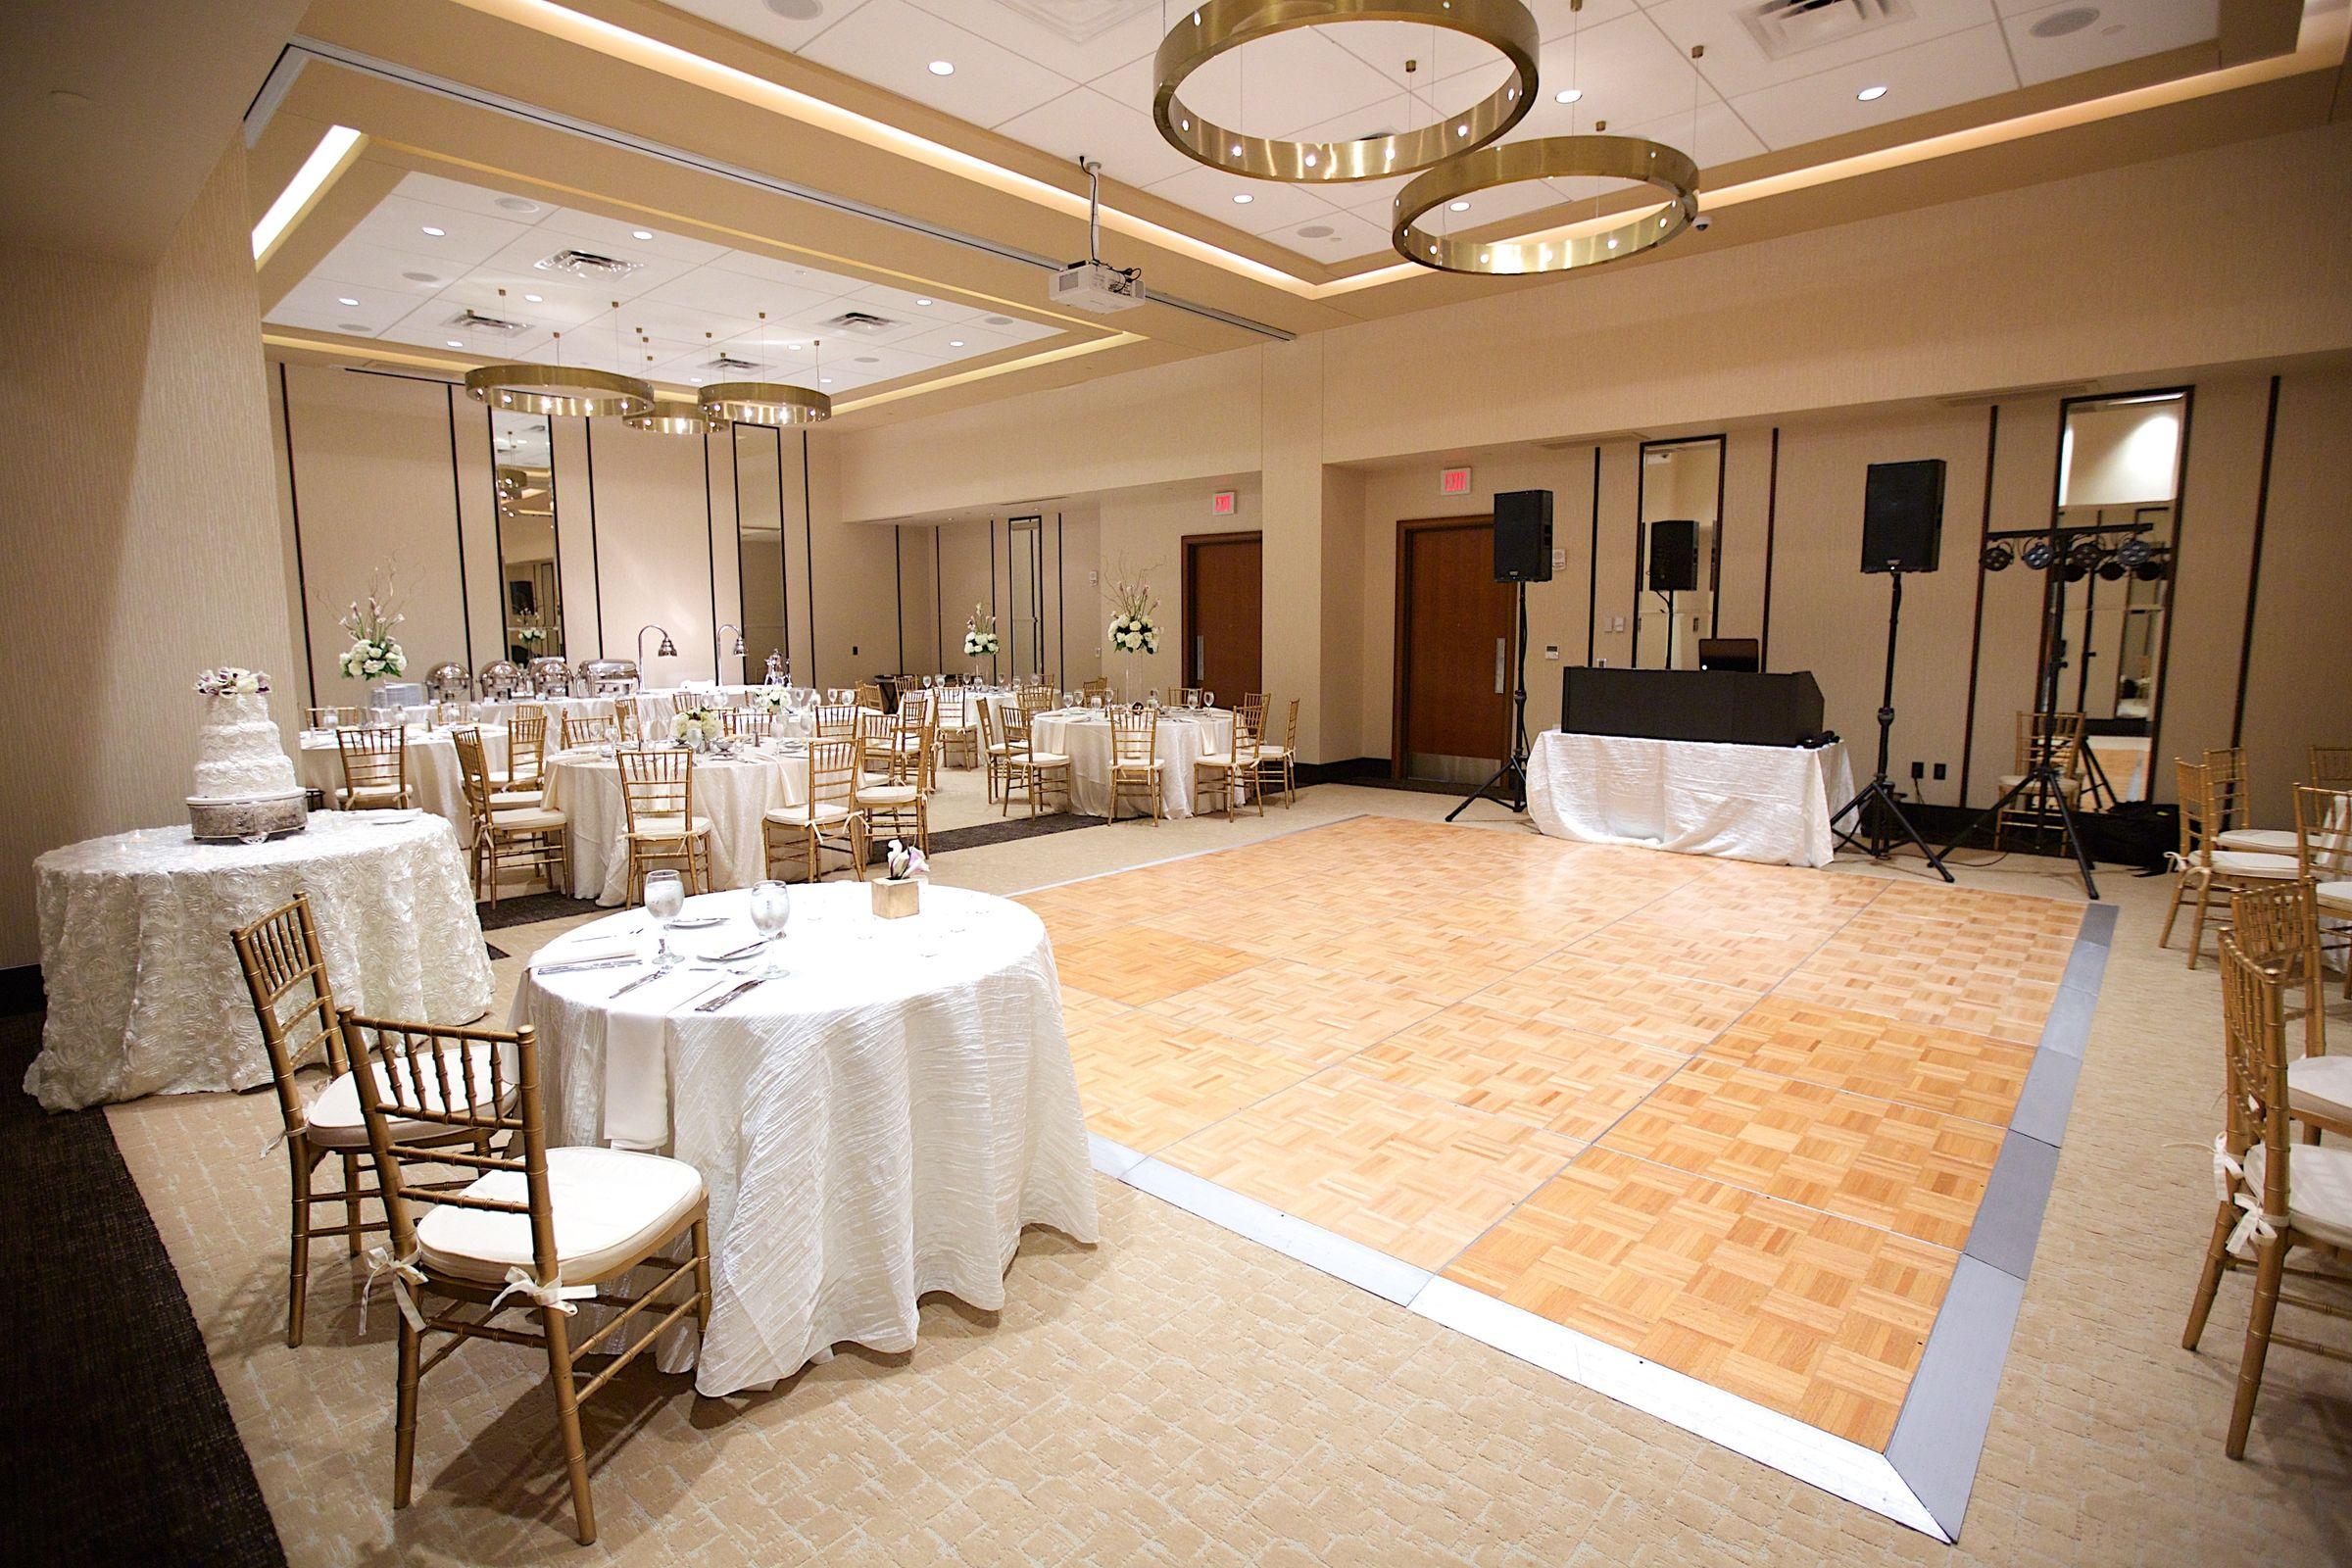 Wedding dance floor at the Hilton Garden Inn Virginia Beach ...